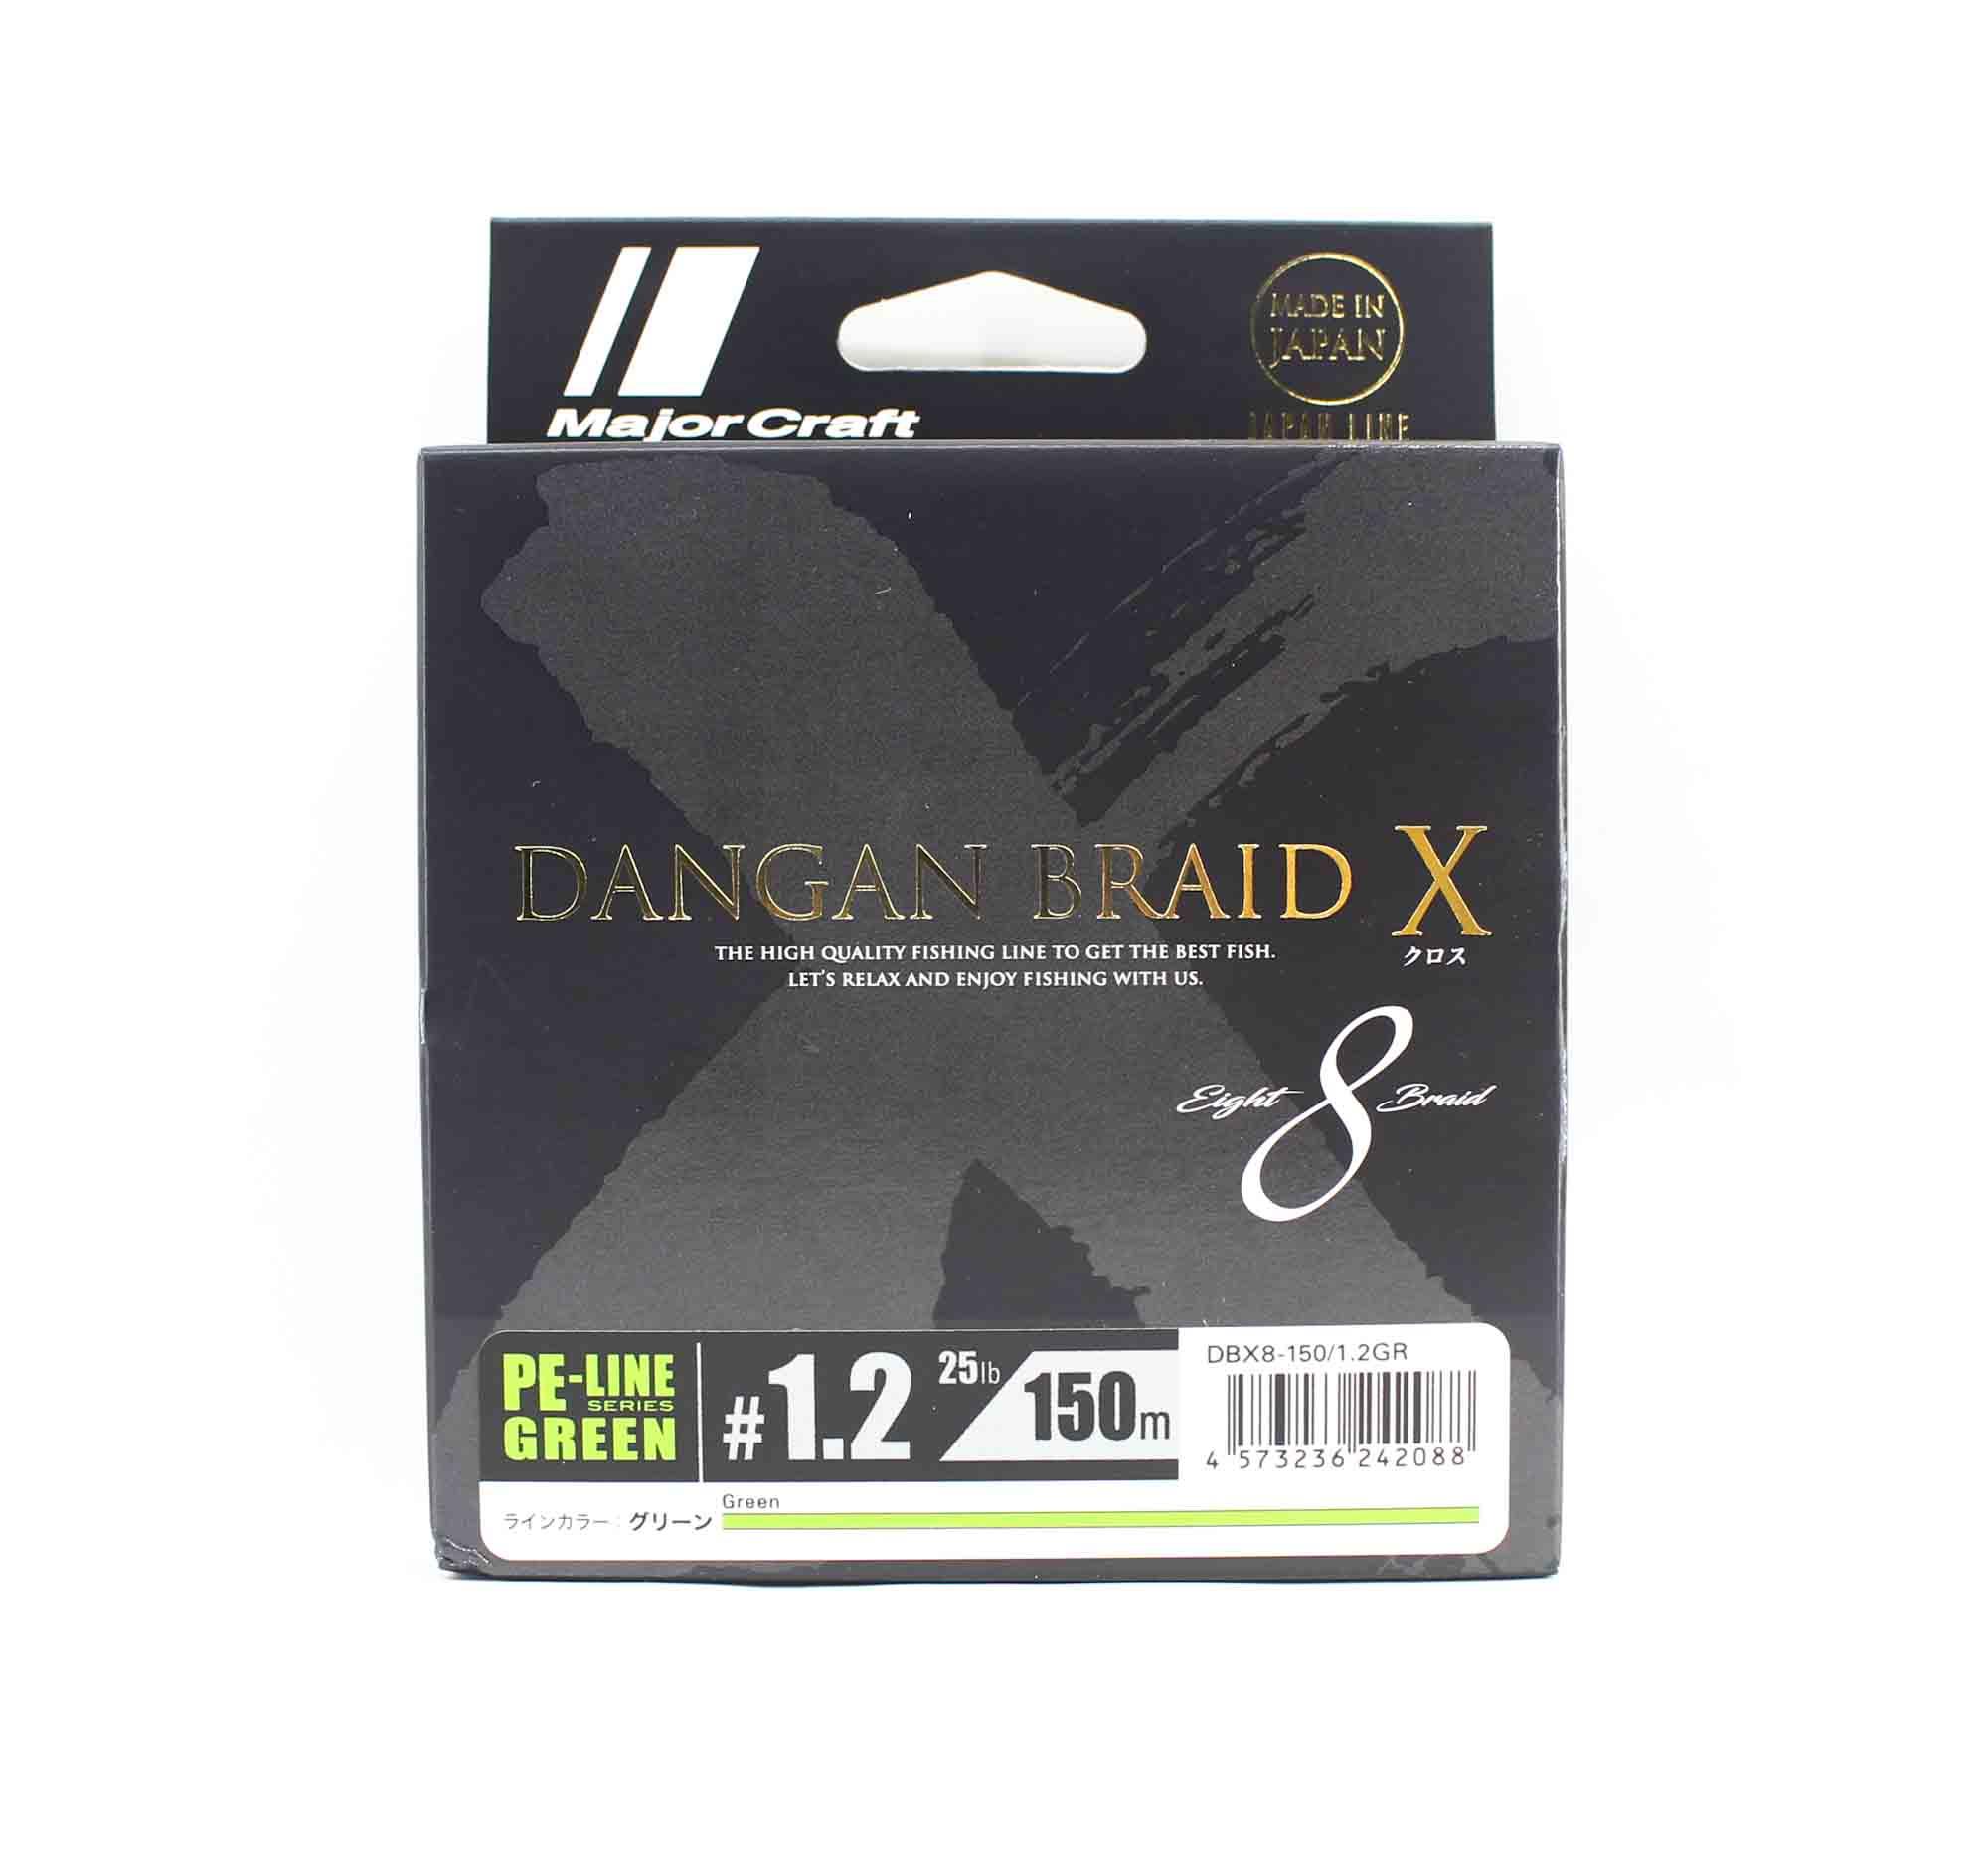 Major Craft Dangan Braid X Line X8 150m P.E 1.2 Green DBX8-150/1.2GR (2088)